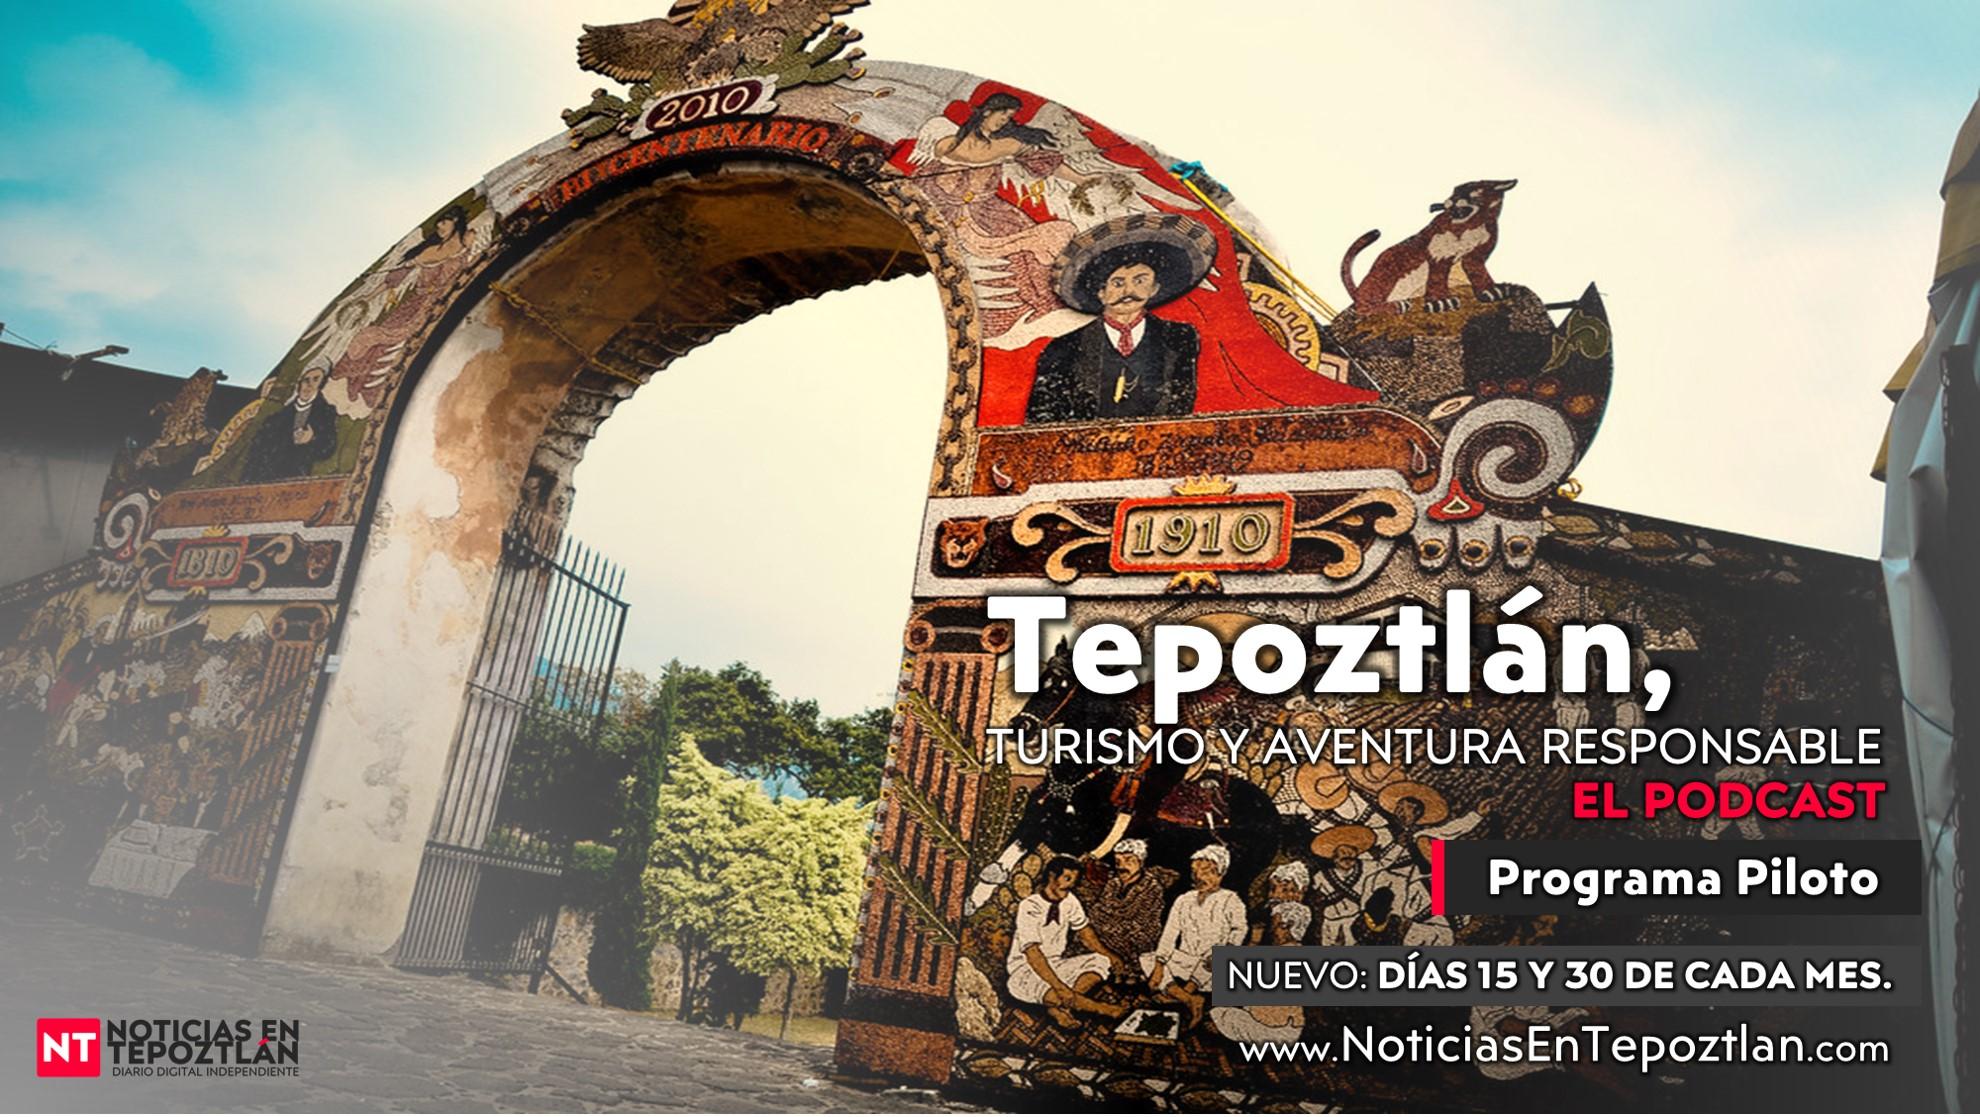 Tepoztlán, Turismo y Aventura Responsable. El Podcast T1:E1: PILOTO